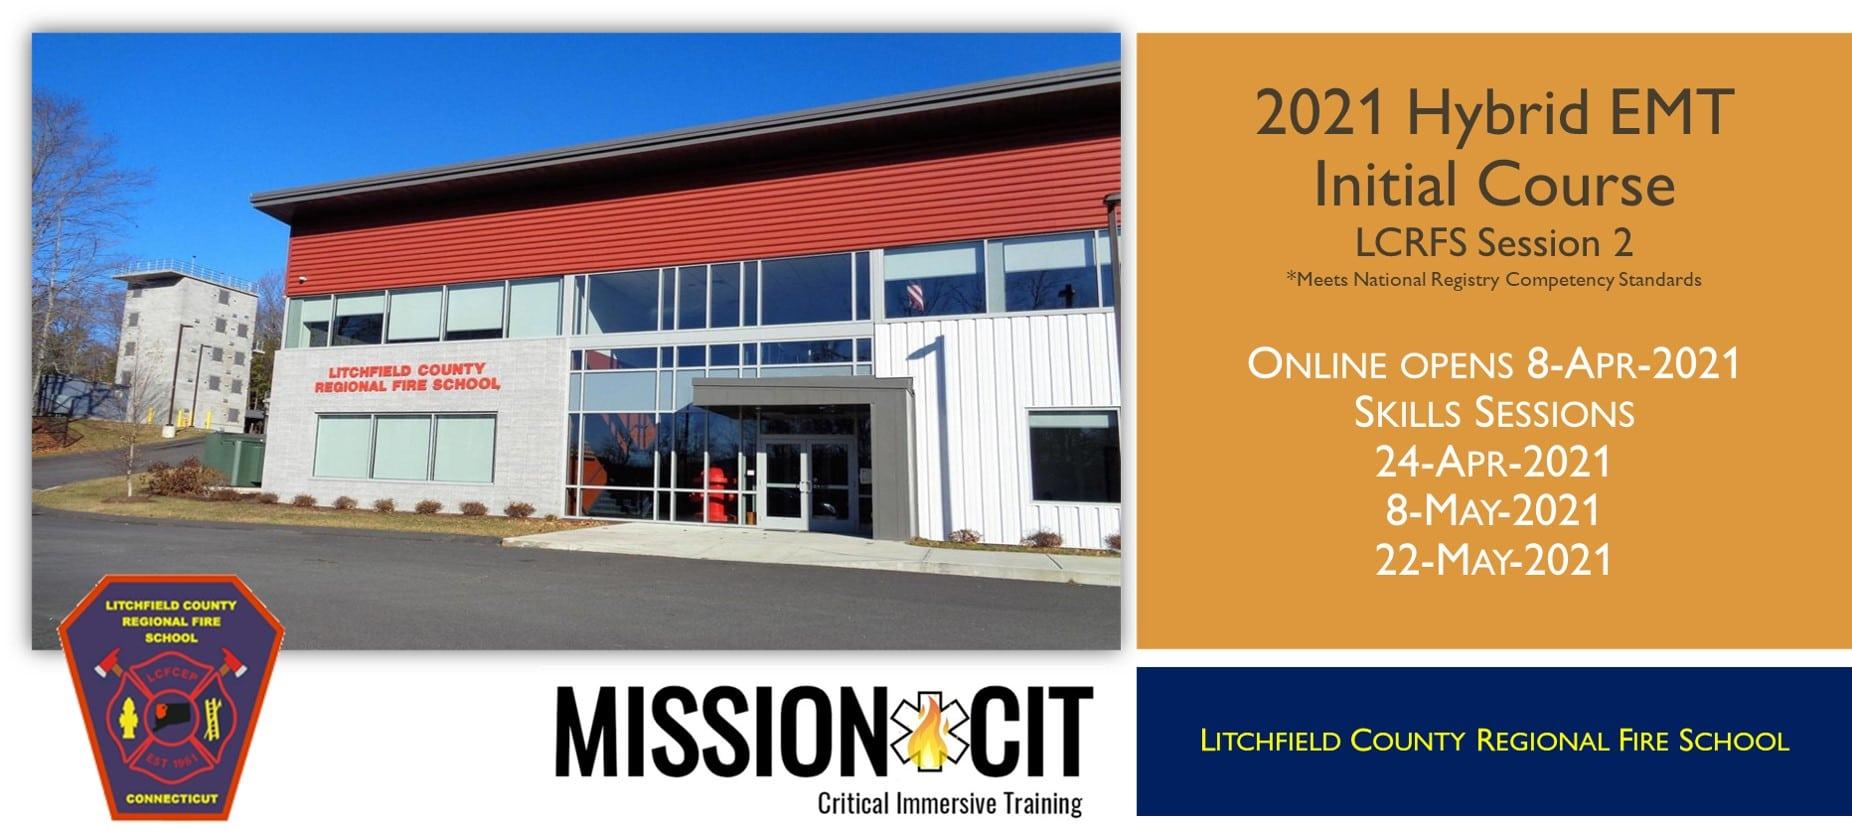 2021 Hybrid EMT Initial Course | LCRFS Session 2